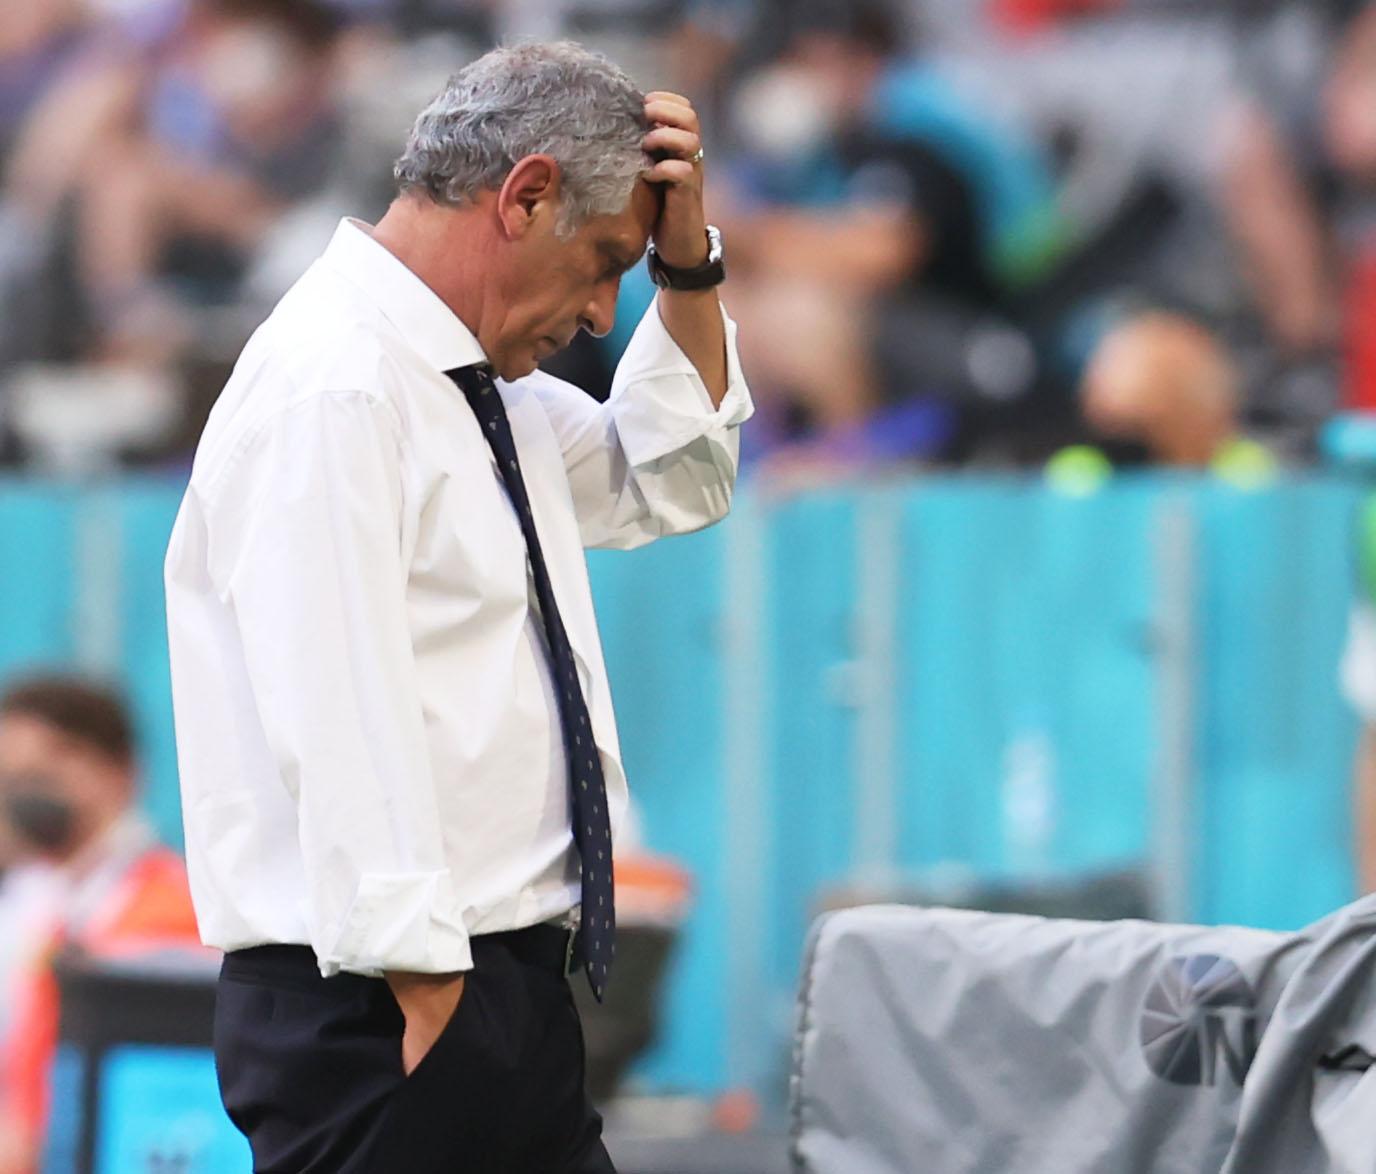 Euro 2020: Ανέλαβε την ευθύνη ο Σάντος